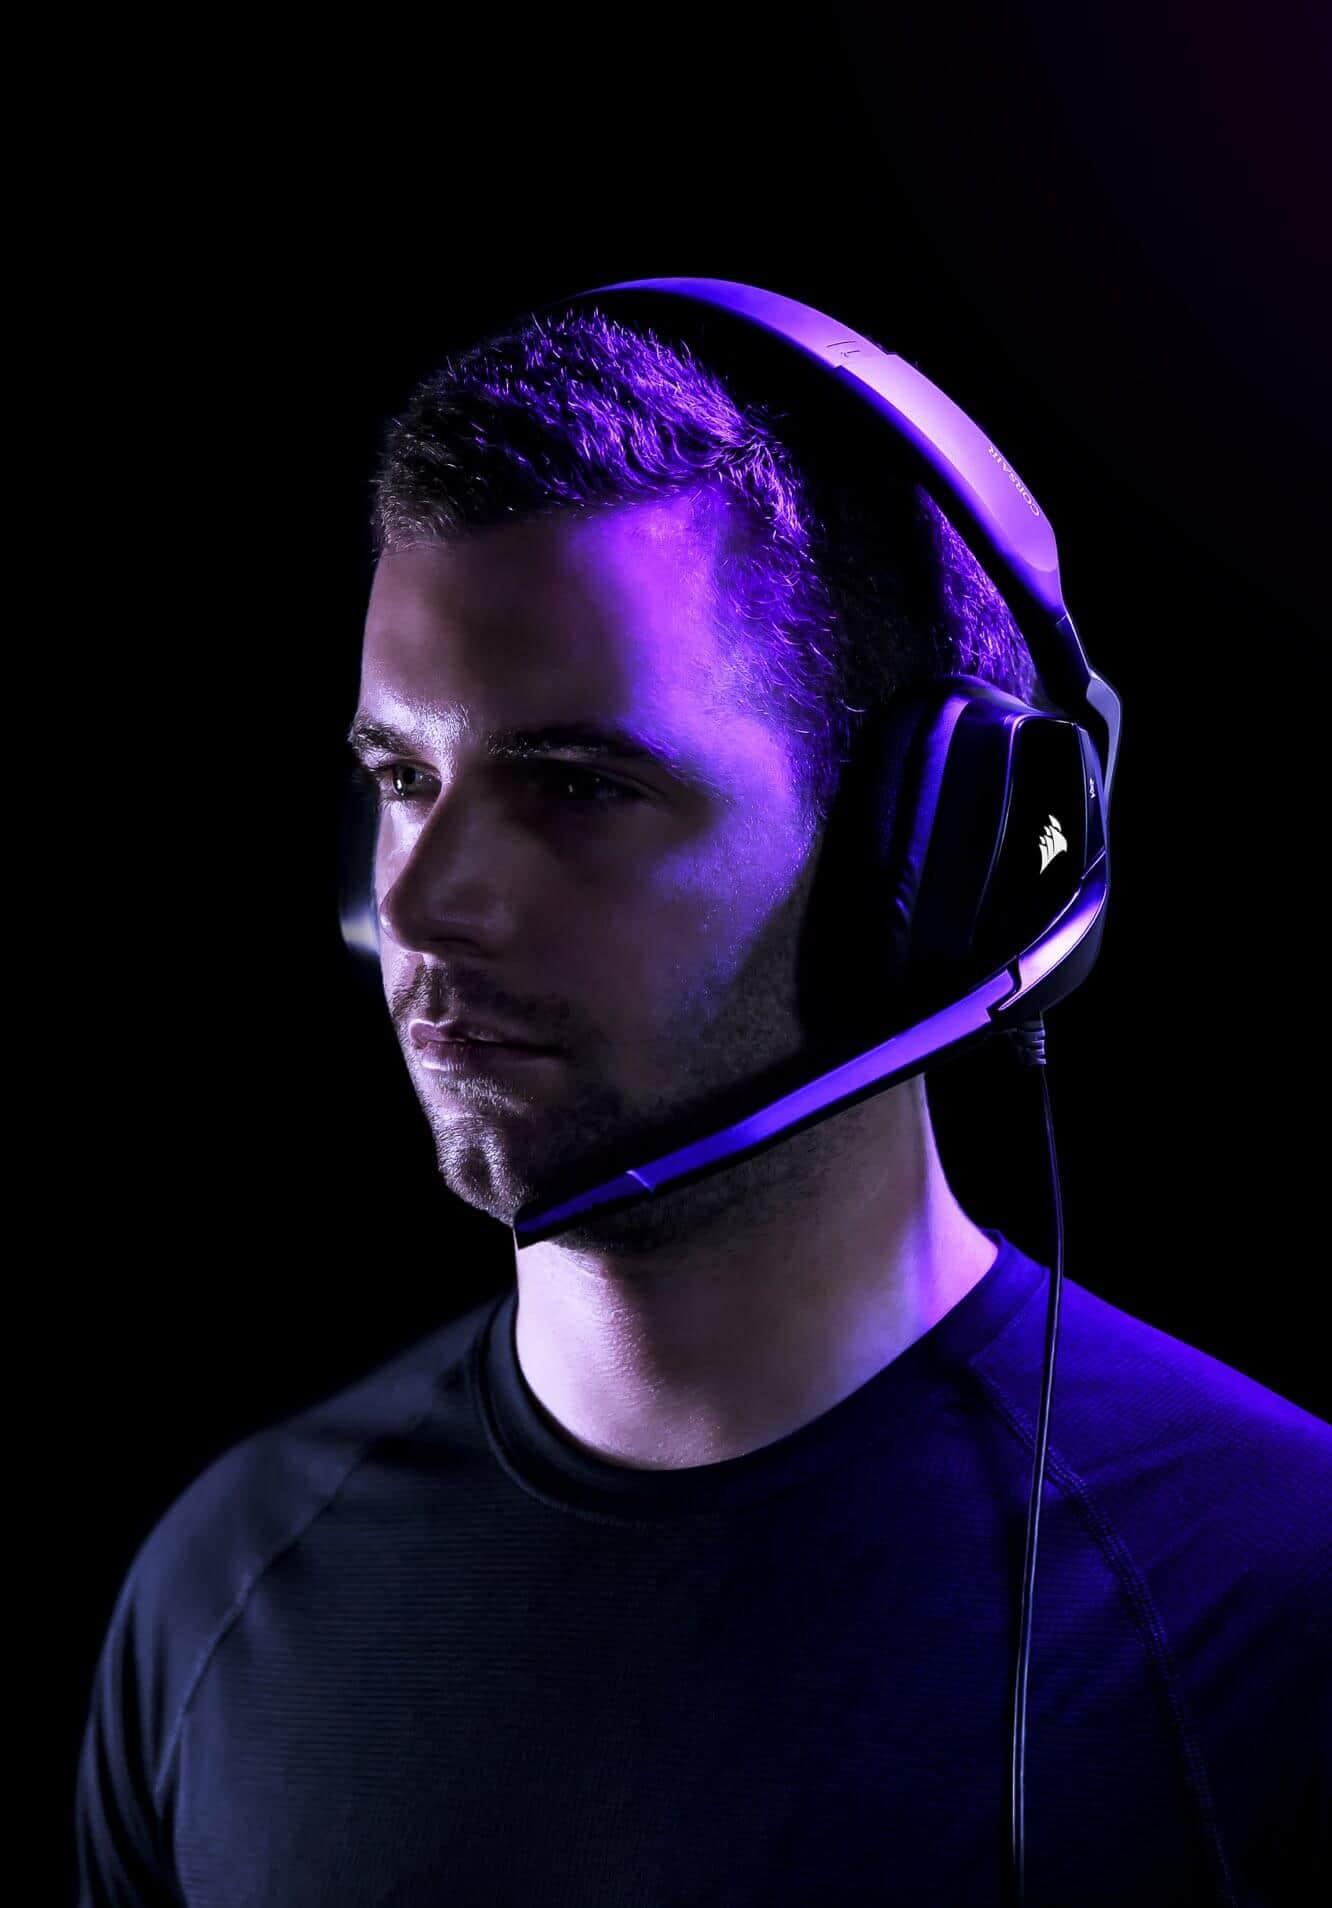 Corsair VOID RGB ELITE USB Premium Gaming Headset with 7.1 Surround Sound — White 19